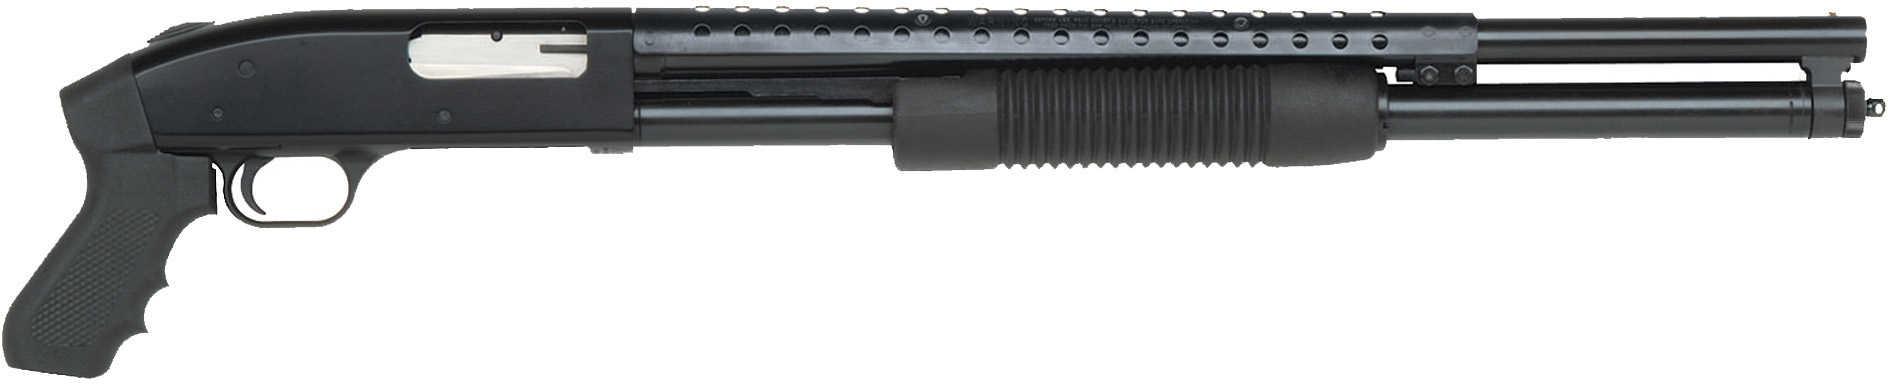 "Mossberg 500 Cruiser 12 Gauge Shotgun 20"" Barrel Heat Shield Pg Only 50580"